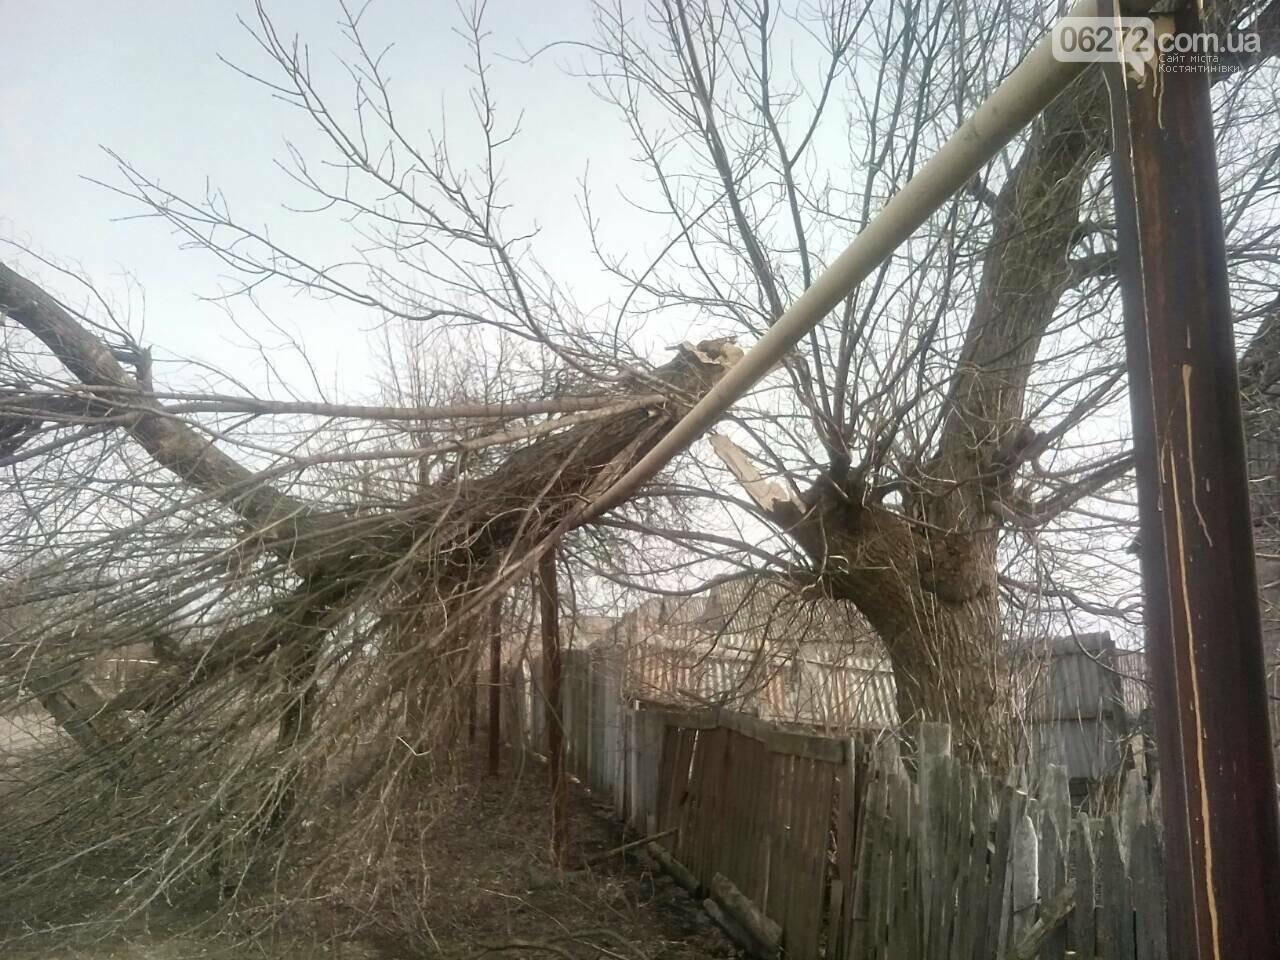 В Константиновском районе дерево упало на столб линии электропередач, фото-1